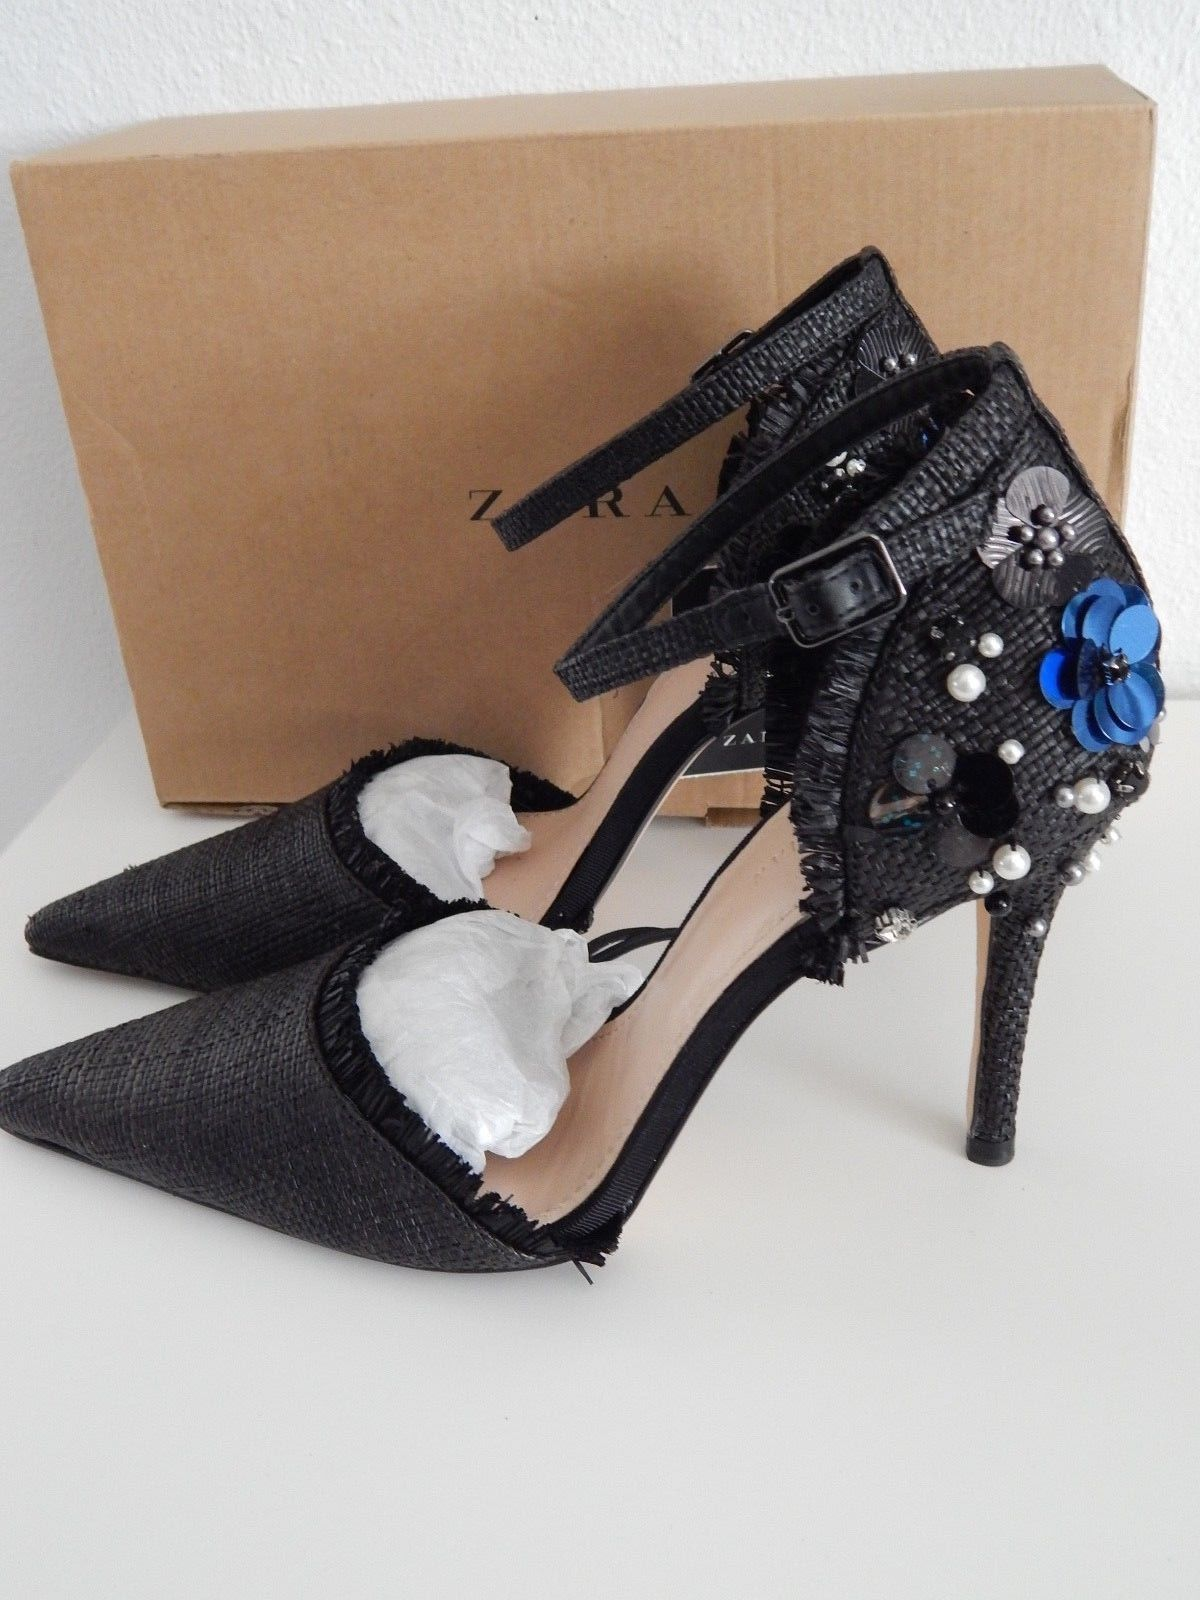 b3be18c9ccf New ZARA Jeweled Pumps Size 38 7.5 Rhinestones   Pearls Ankle Strap High 4  Blac